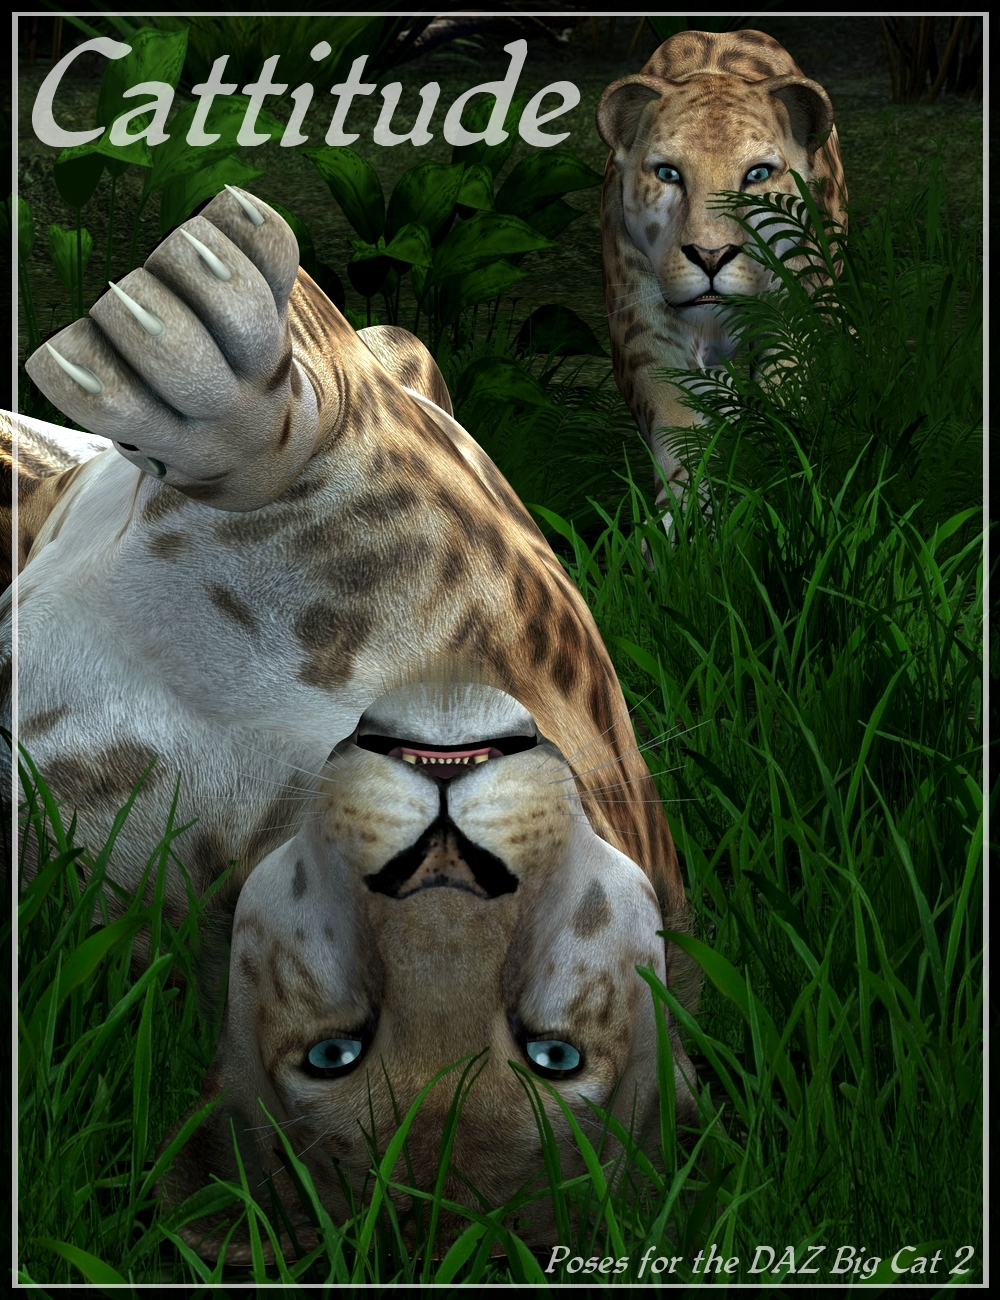 Cattitude Poses for DAZ Big Cat 2 by: Elliandra, 3D Models by Daz 3D